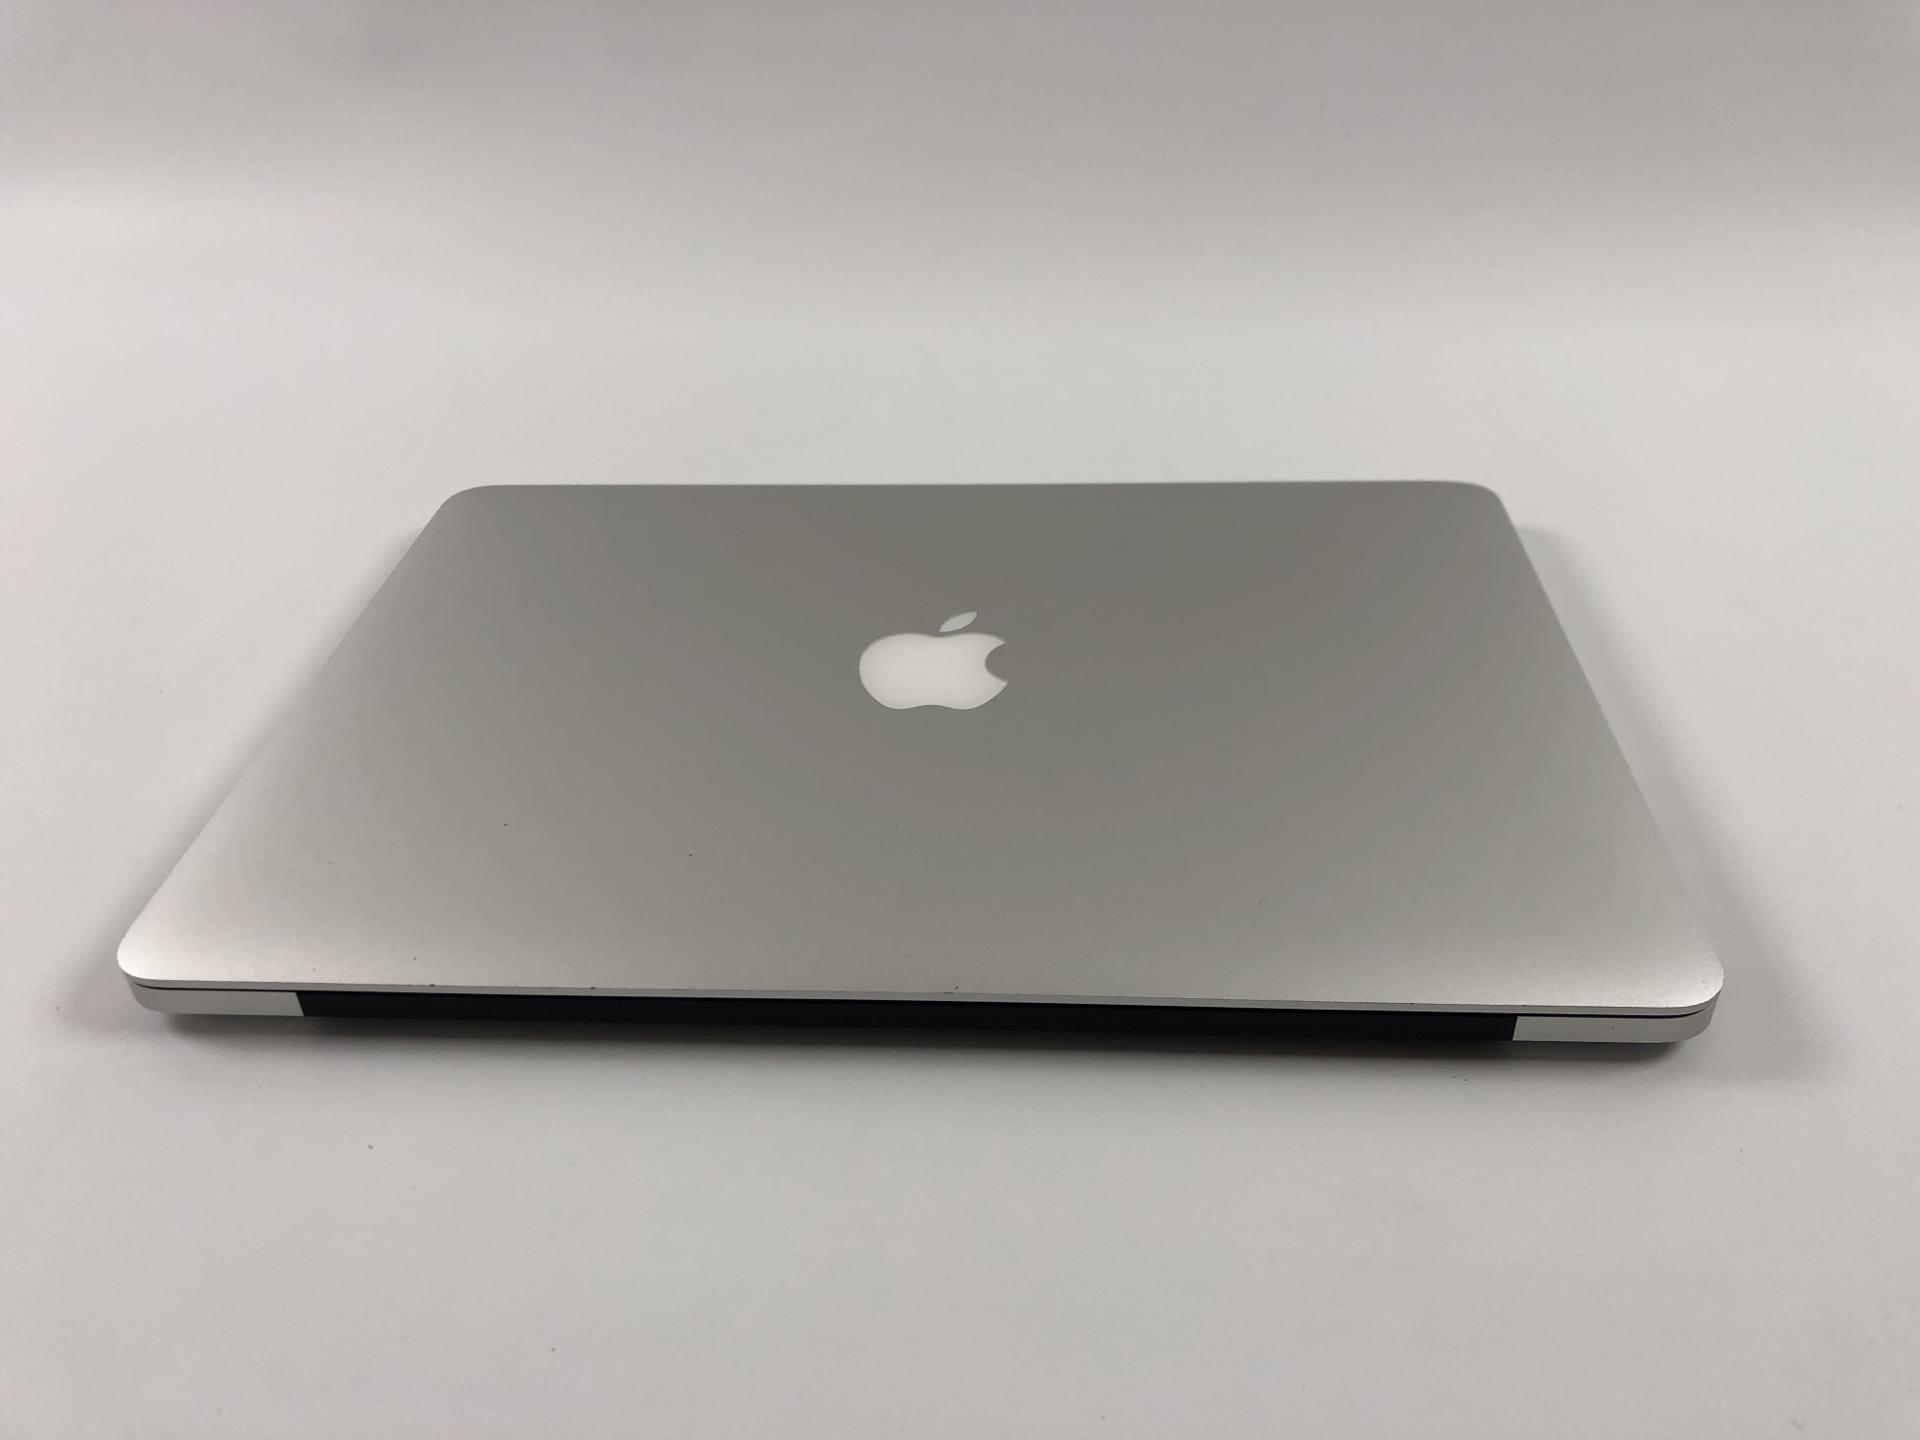 "MacBook Pro Retina 13"" Early 2015 (Intel Core i5 2.9 GHz 16 GB RAM 512 GB SSD), Intel Core i5 2.9 GHz, 16 GB RAM, 512 GB SSD, Kuva 3"